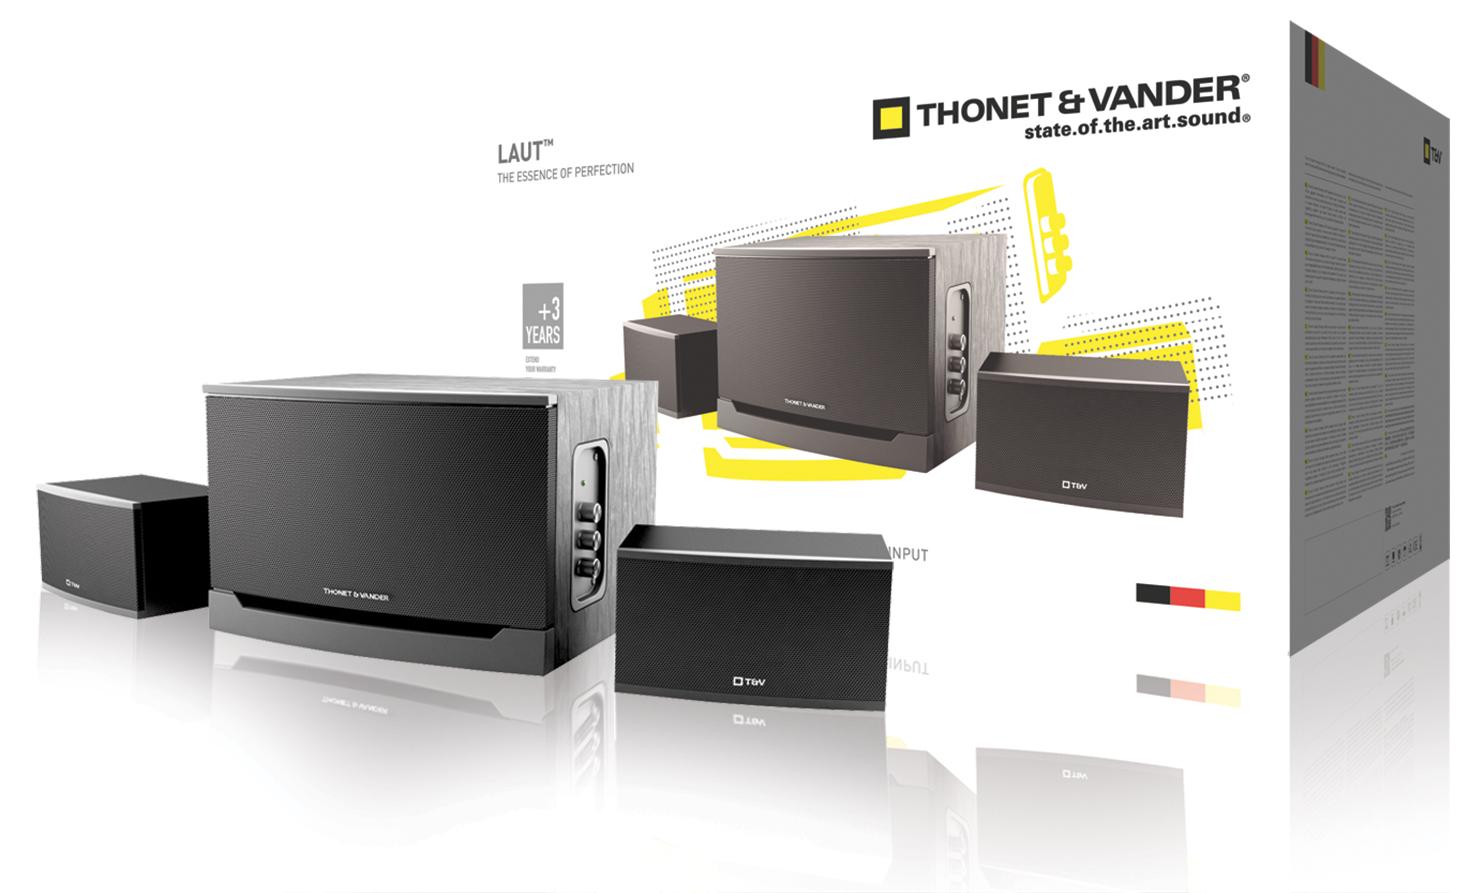 Thonet & Vander TH-03540BL - Laut - reproduktory 2.1, 35W - TH-03540BL